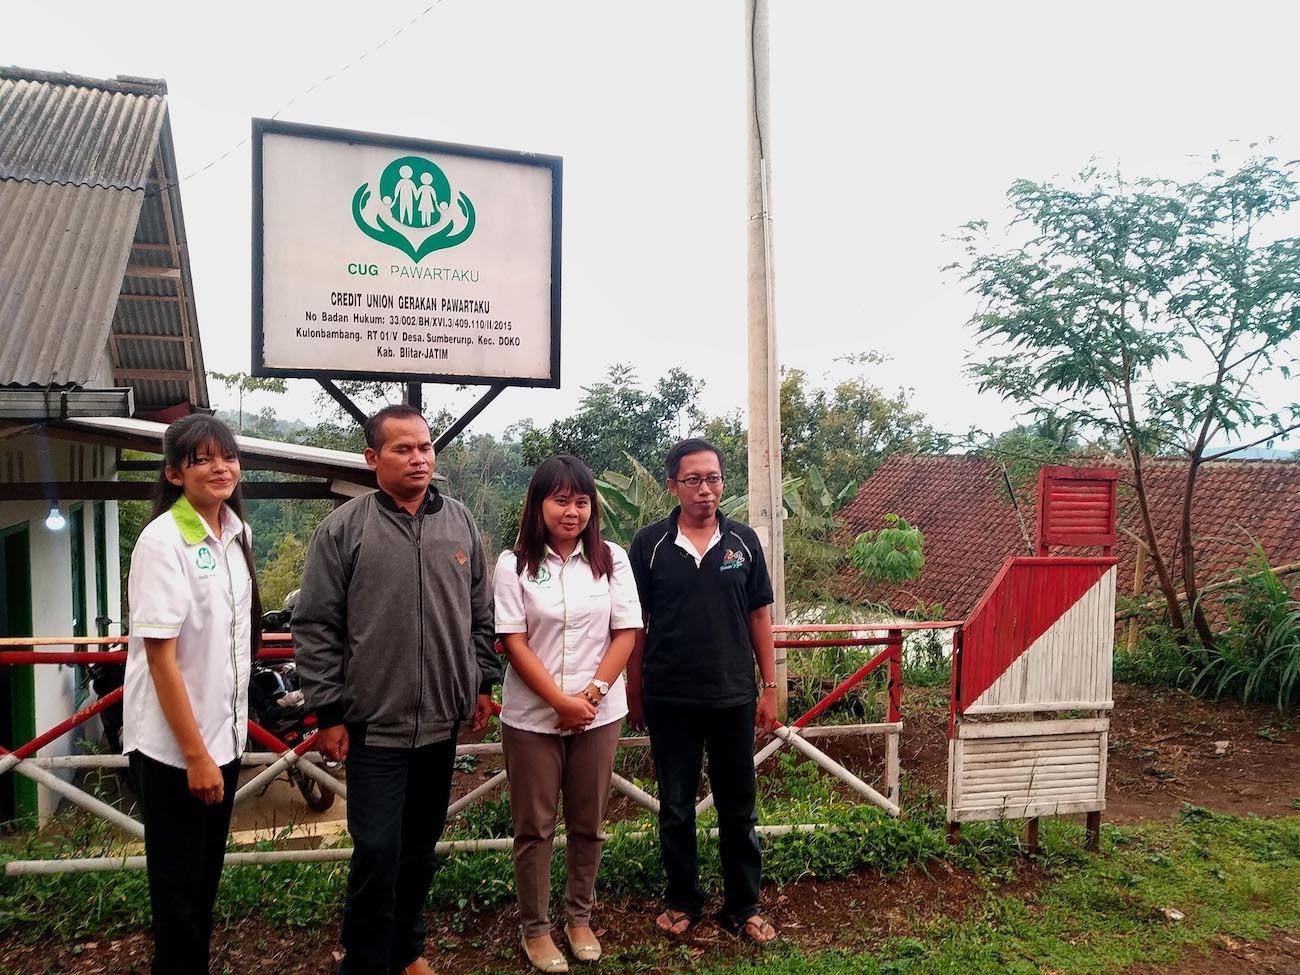 East Java farmers form credit union to break 'curse' of lifetime labor